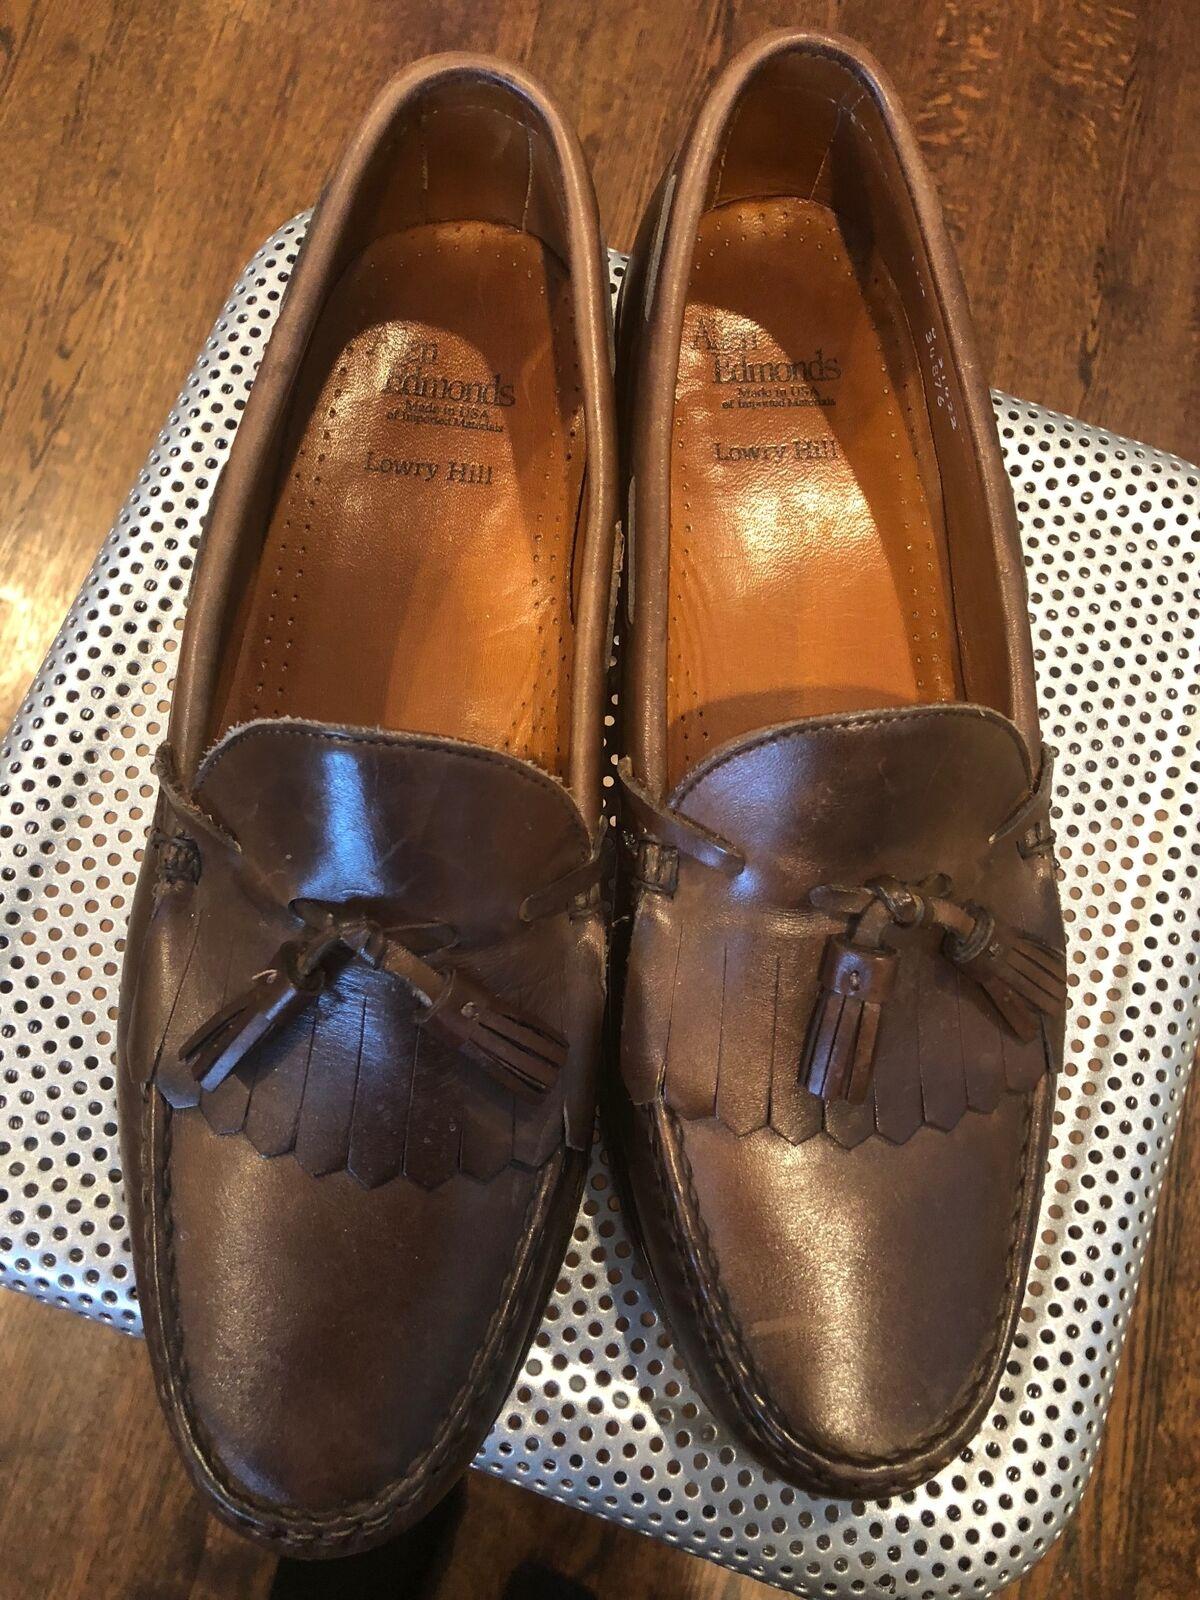 EUC ALLEN EDMONDS Lowry Hill Tassel Loafers SZ 11.5 D Scarpe classiche da uomo